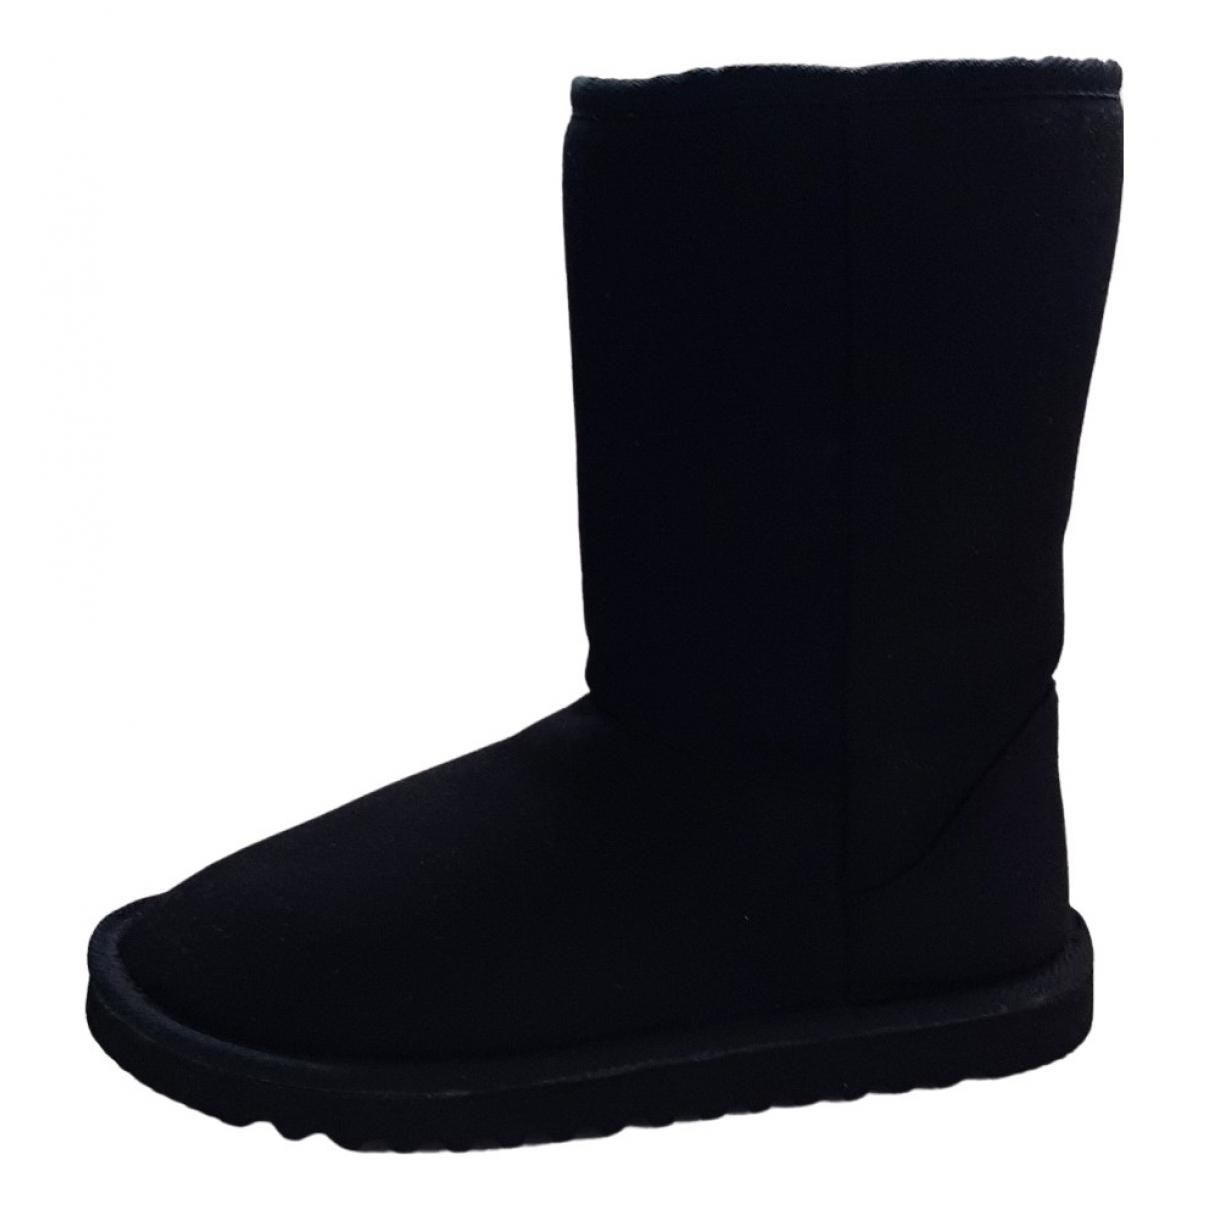 Patrizia Pepe N Black Faux fur Boots for Women 36 IT